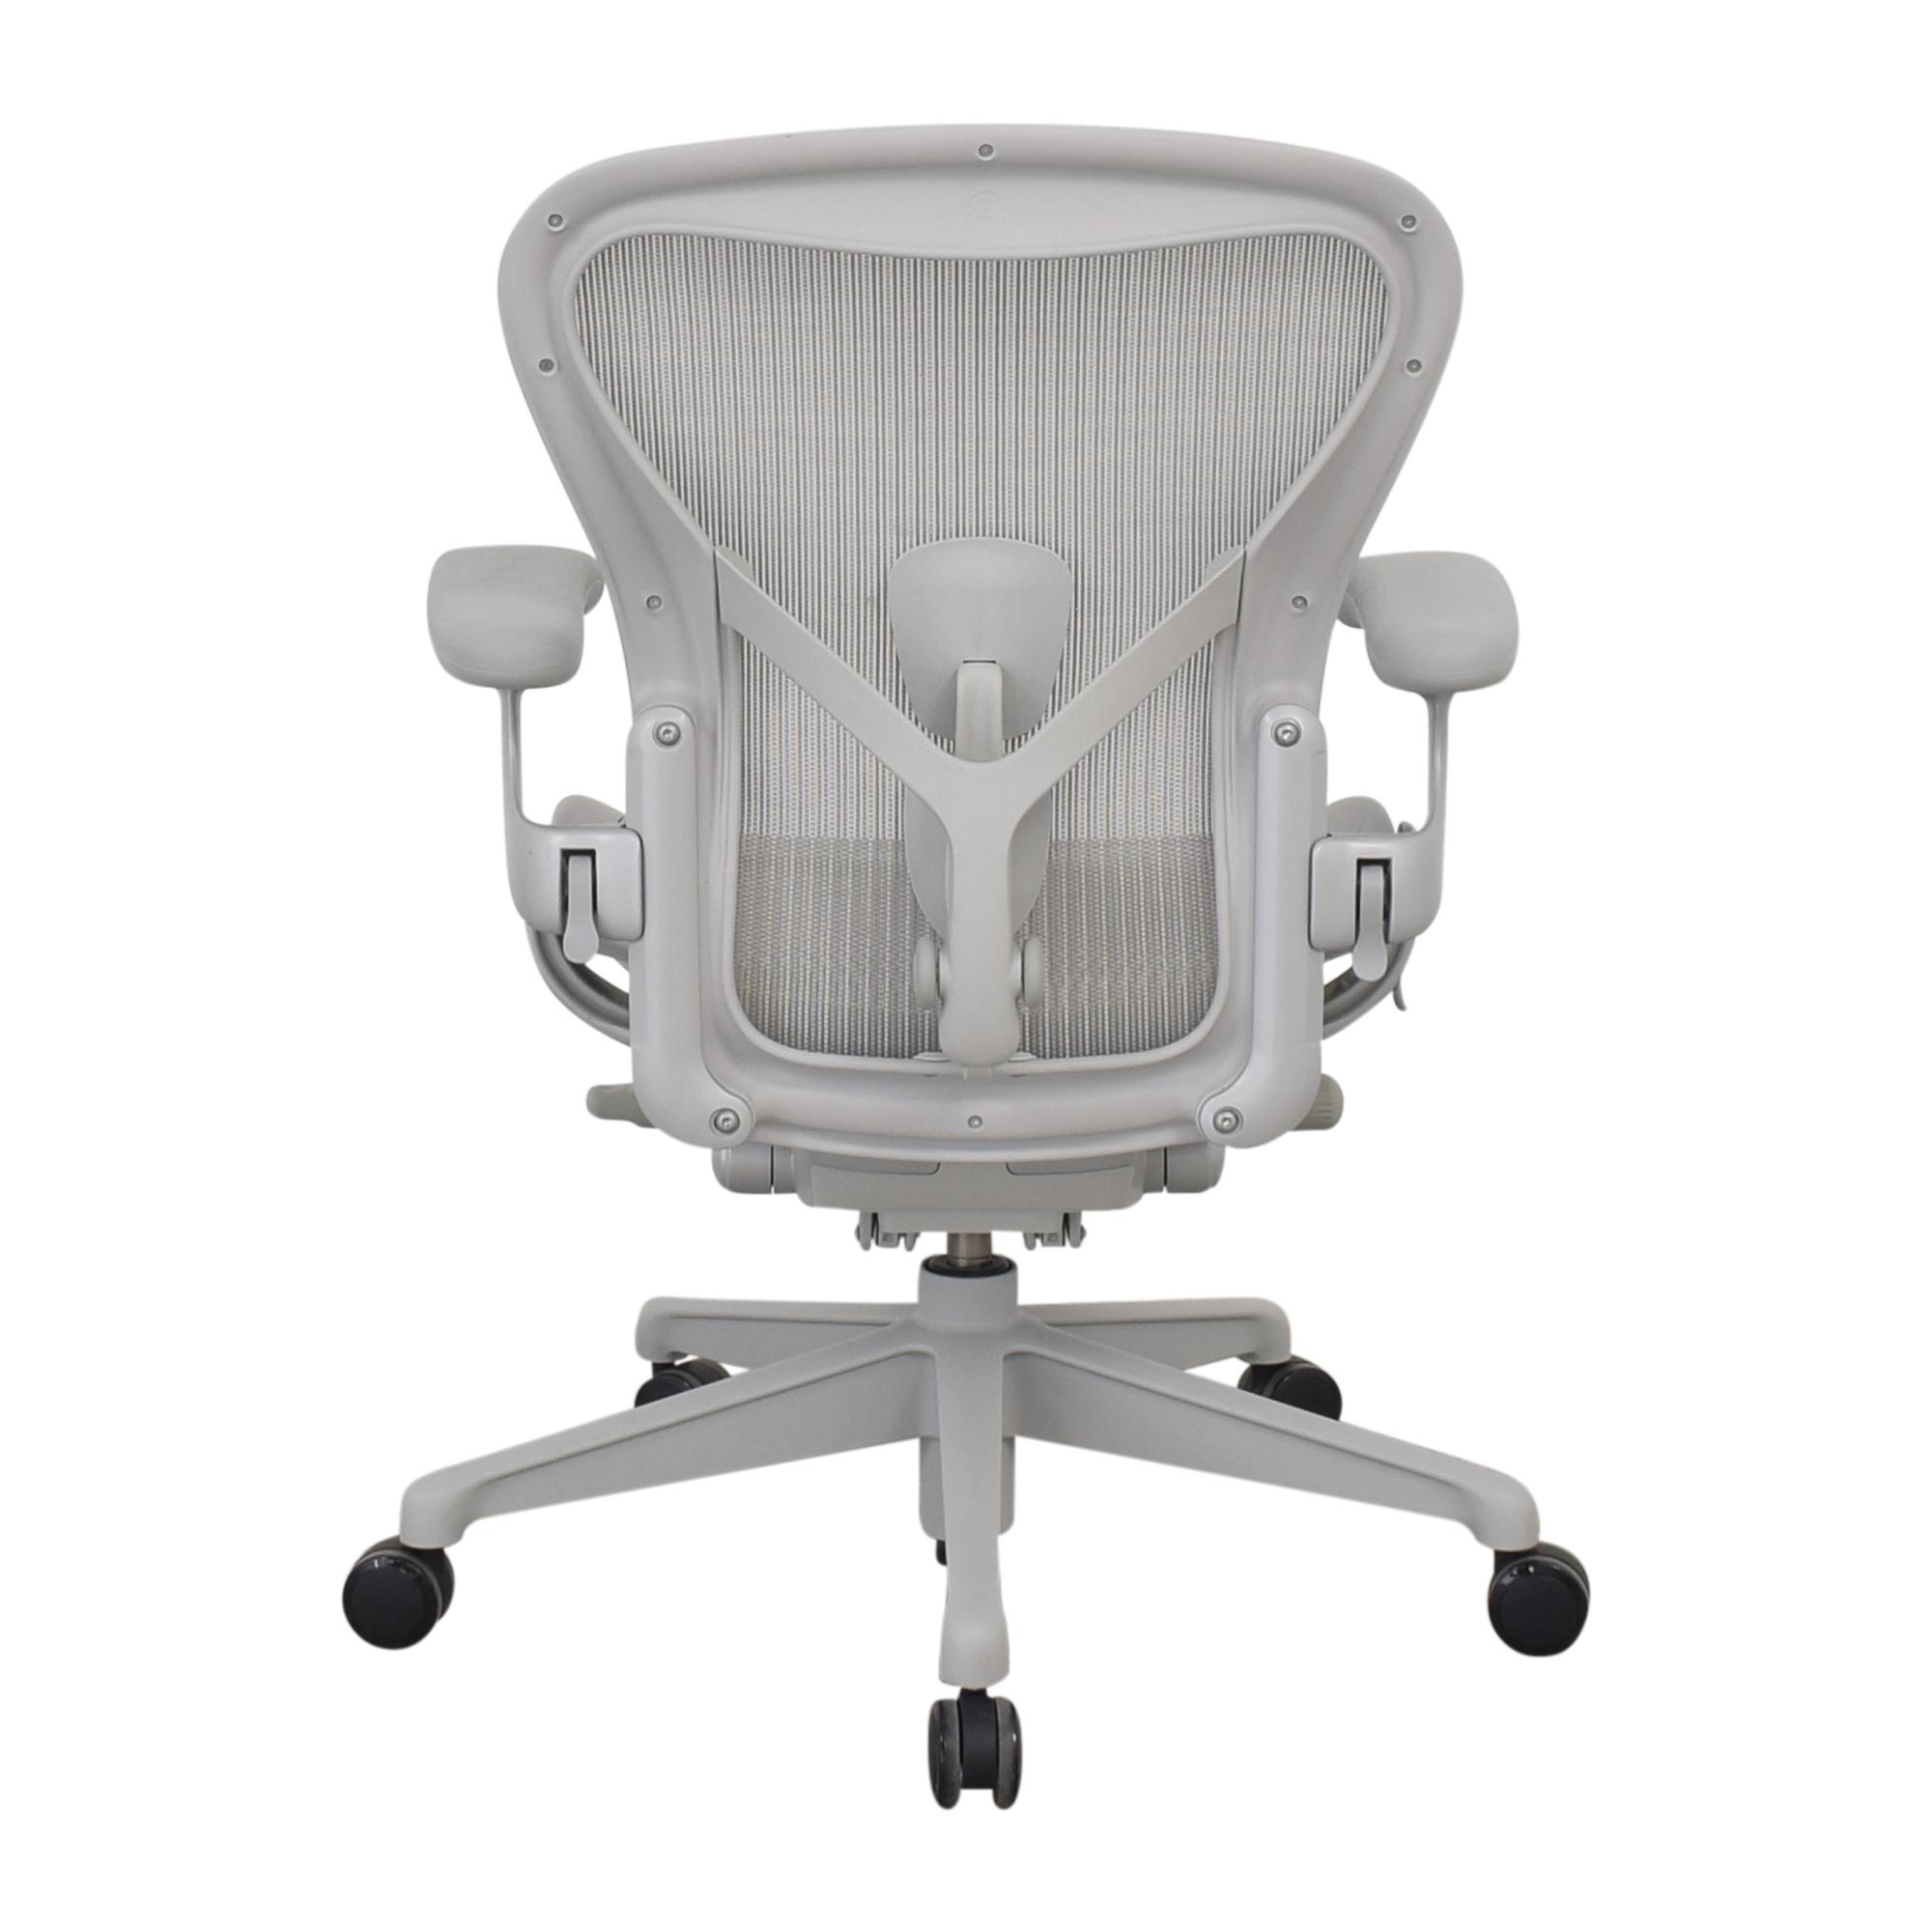 Herman Miller Herman Miller Size B Aeron Chair dimensions